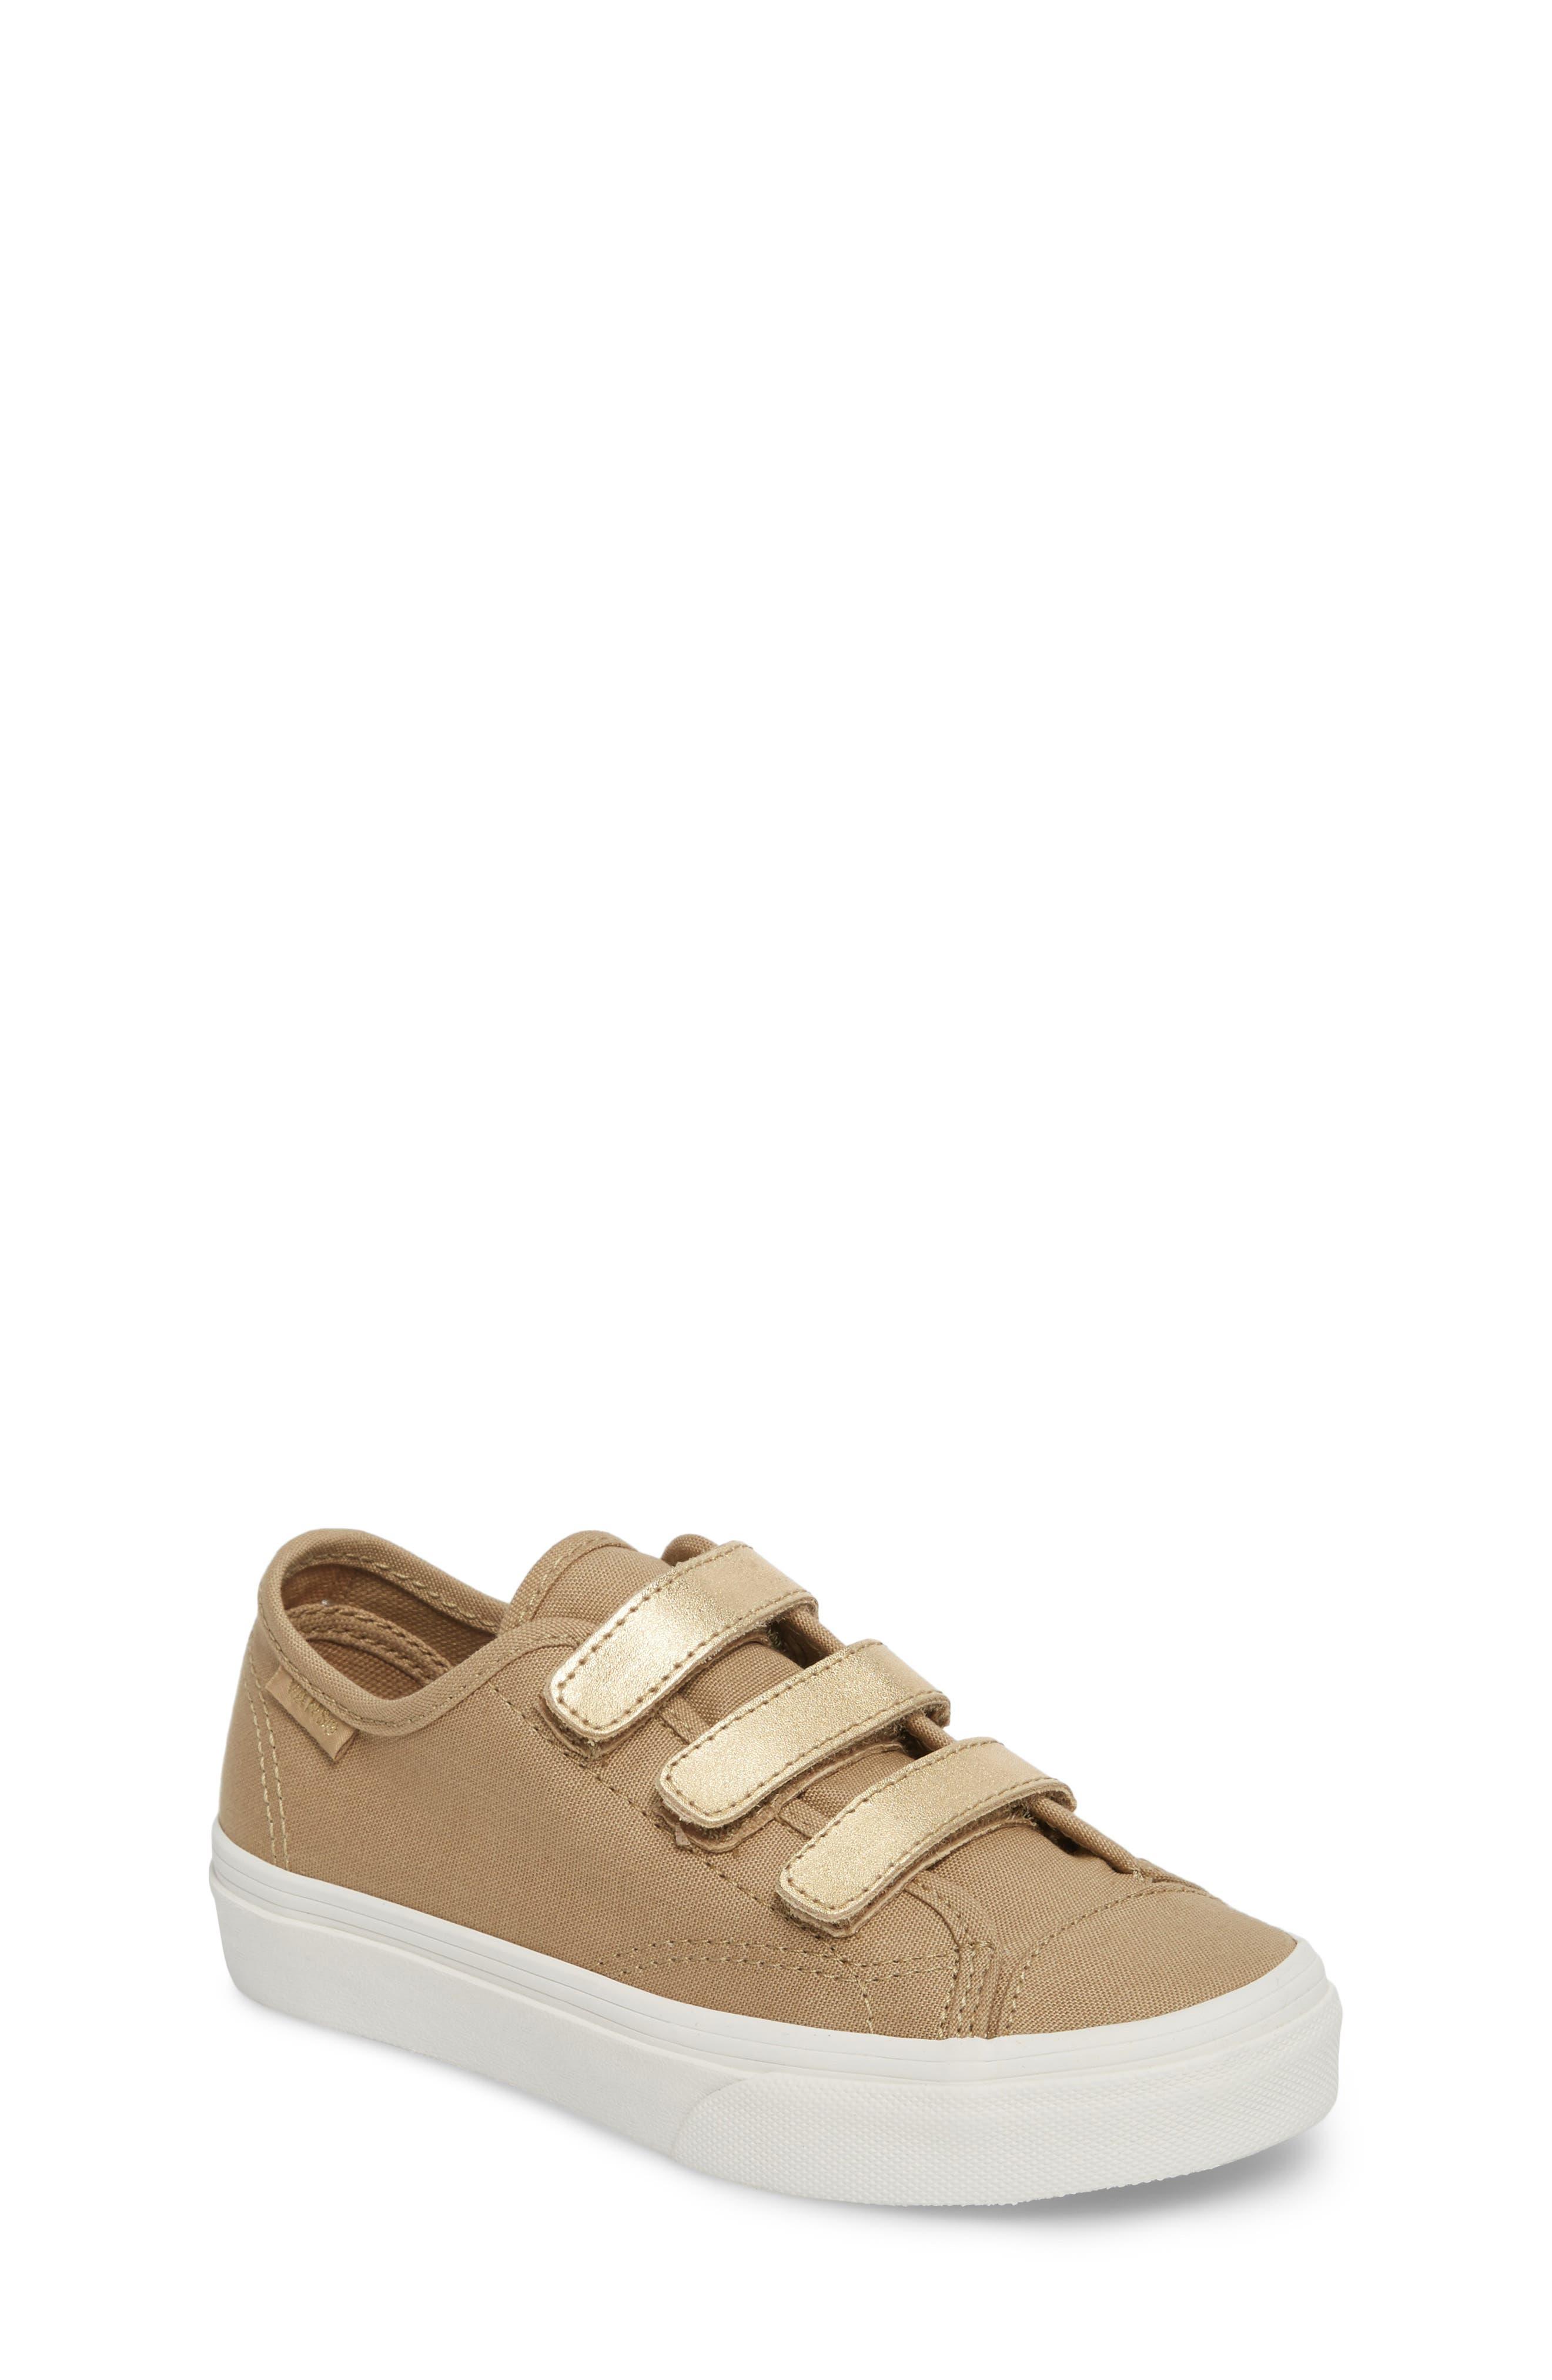 Style 23V Sneaker,                         Main,                         color,